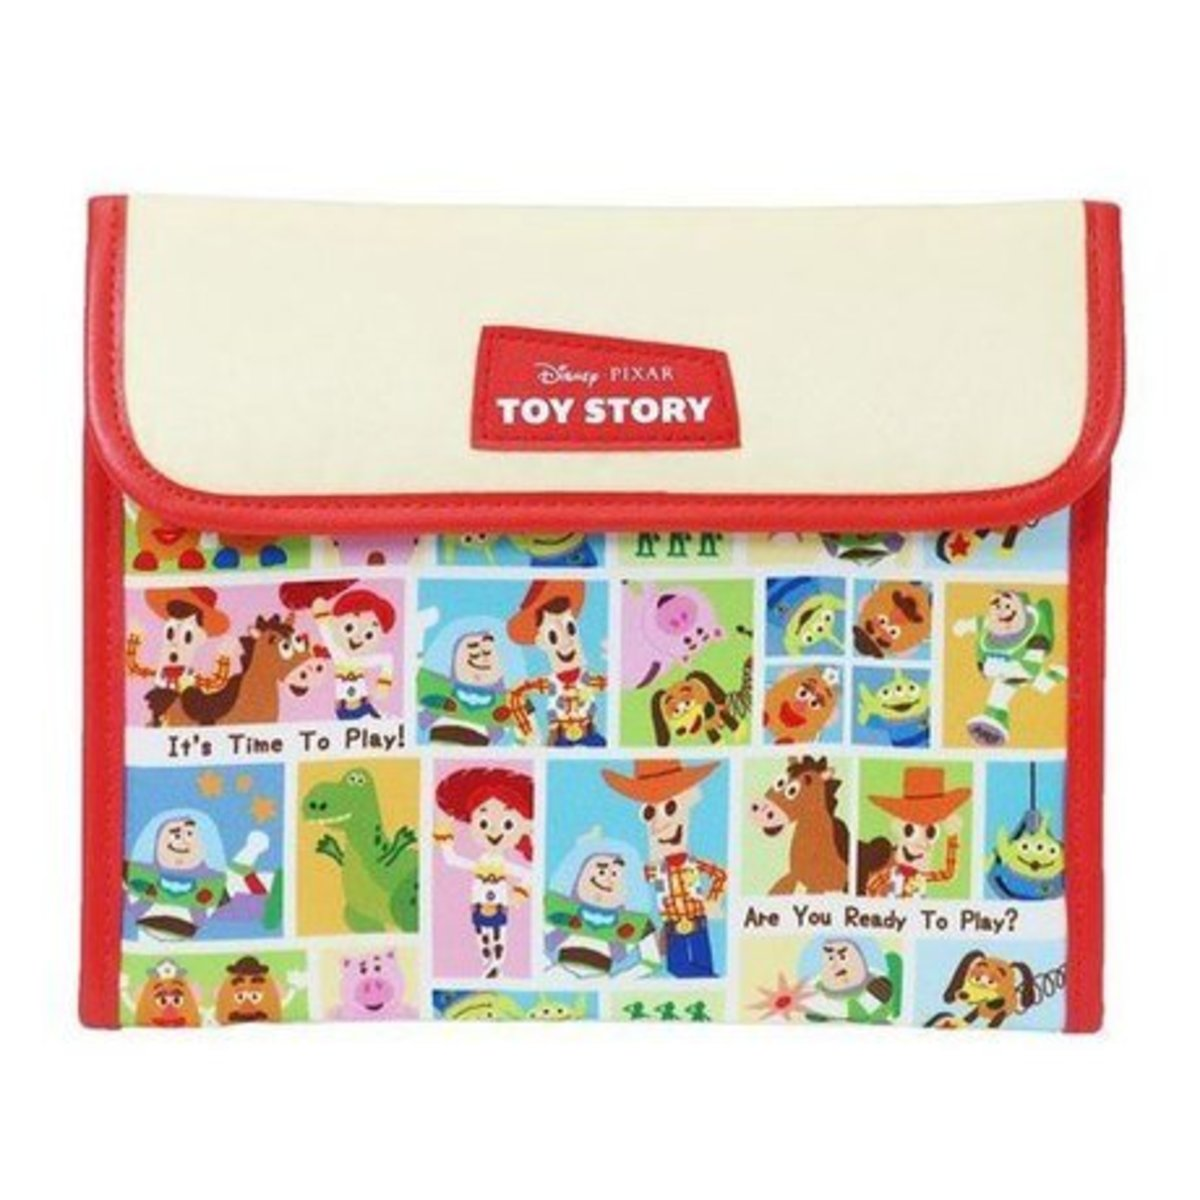 (N/Toy Story) Japan Disney Mother-Child Documents Storage Bag